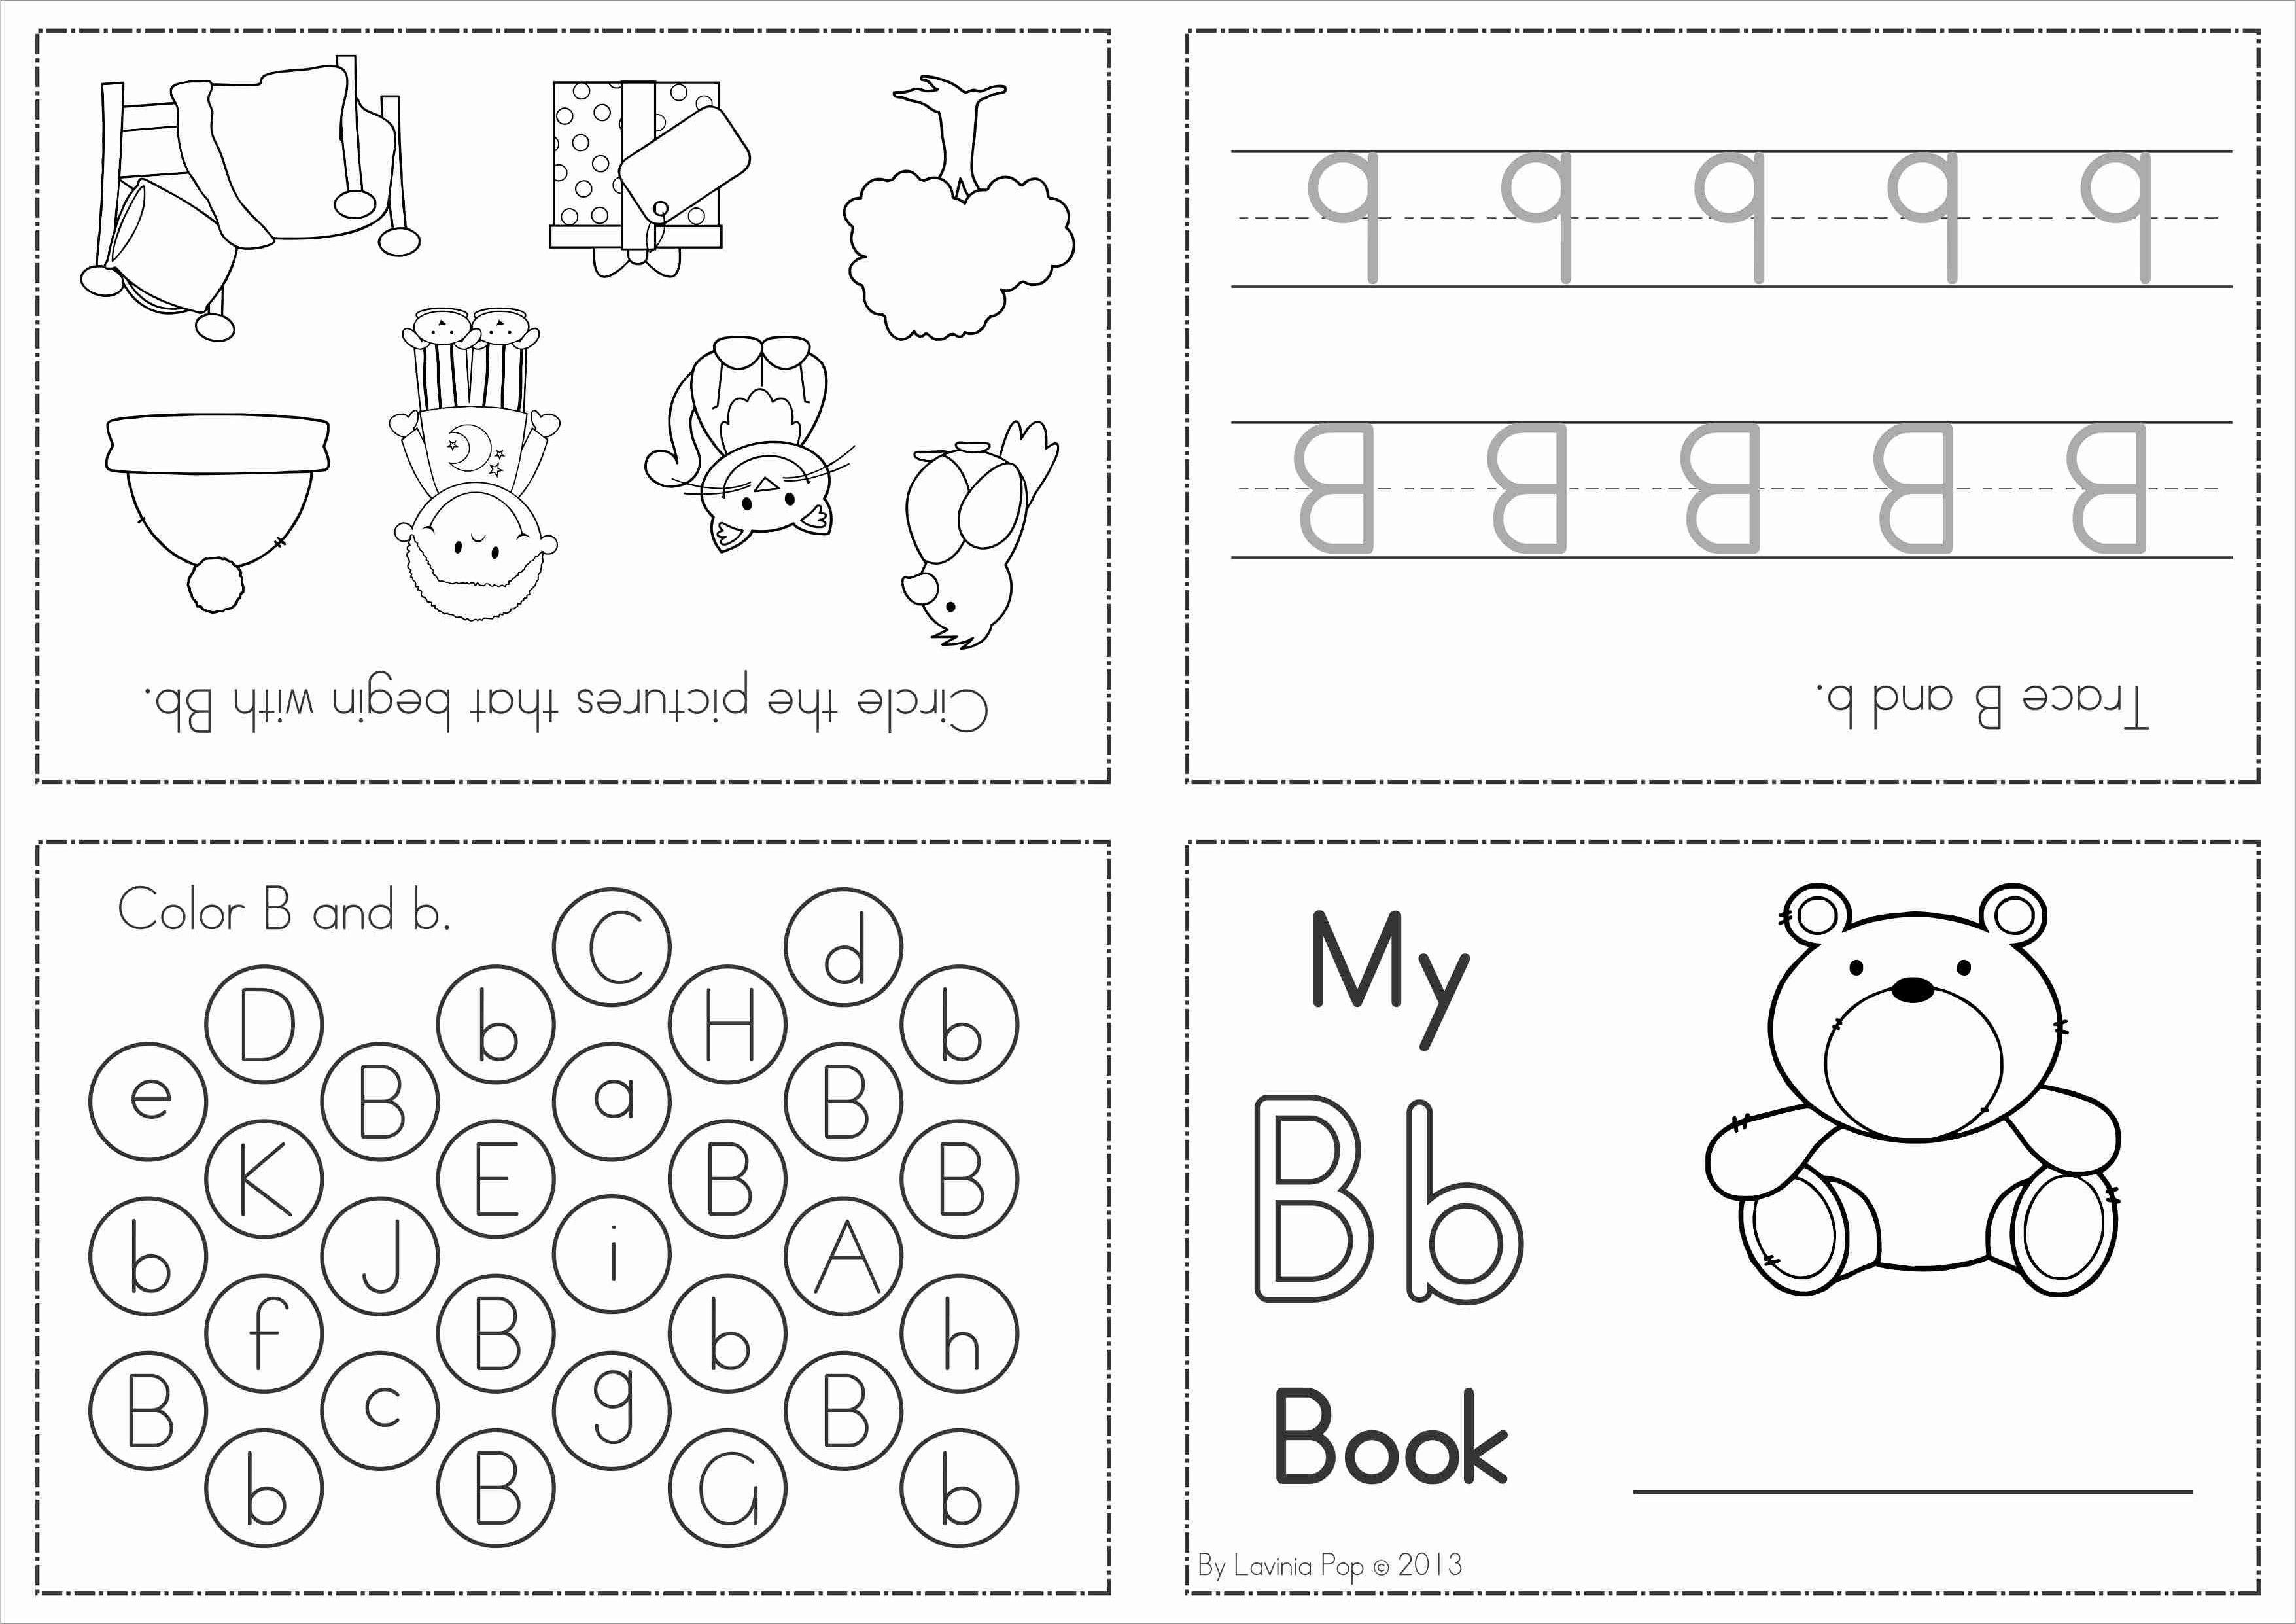 Free Back To School Alphabet Phonics Letter Of The Week B Alphabet Phonics Preschool Letters Alphabet Preschool